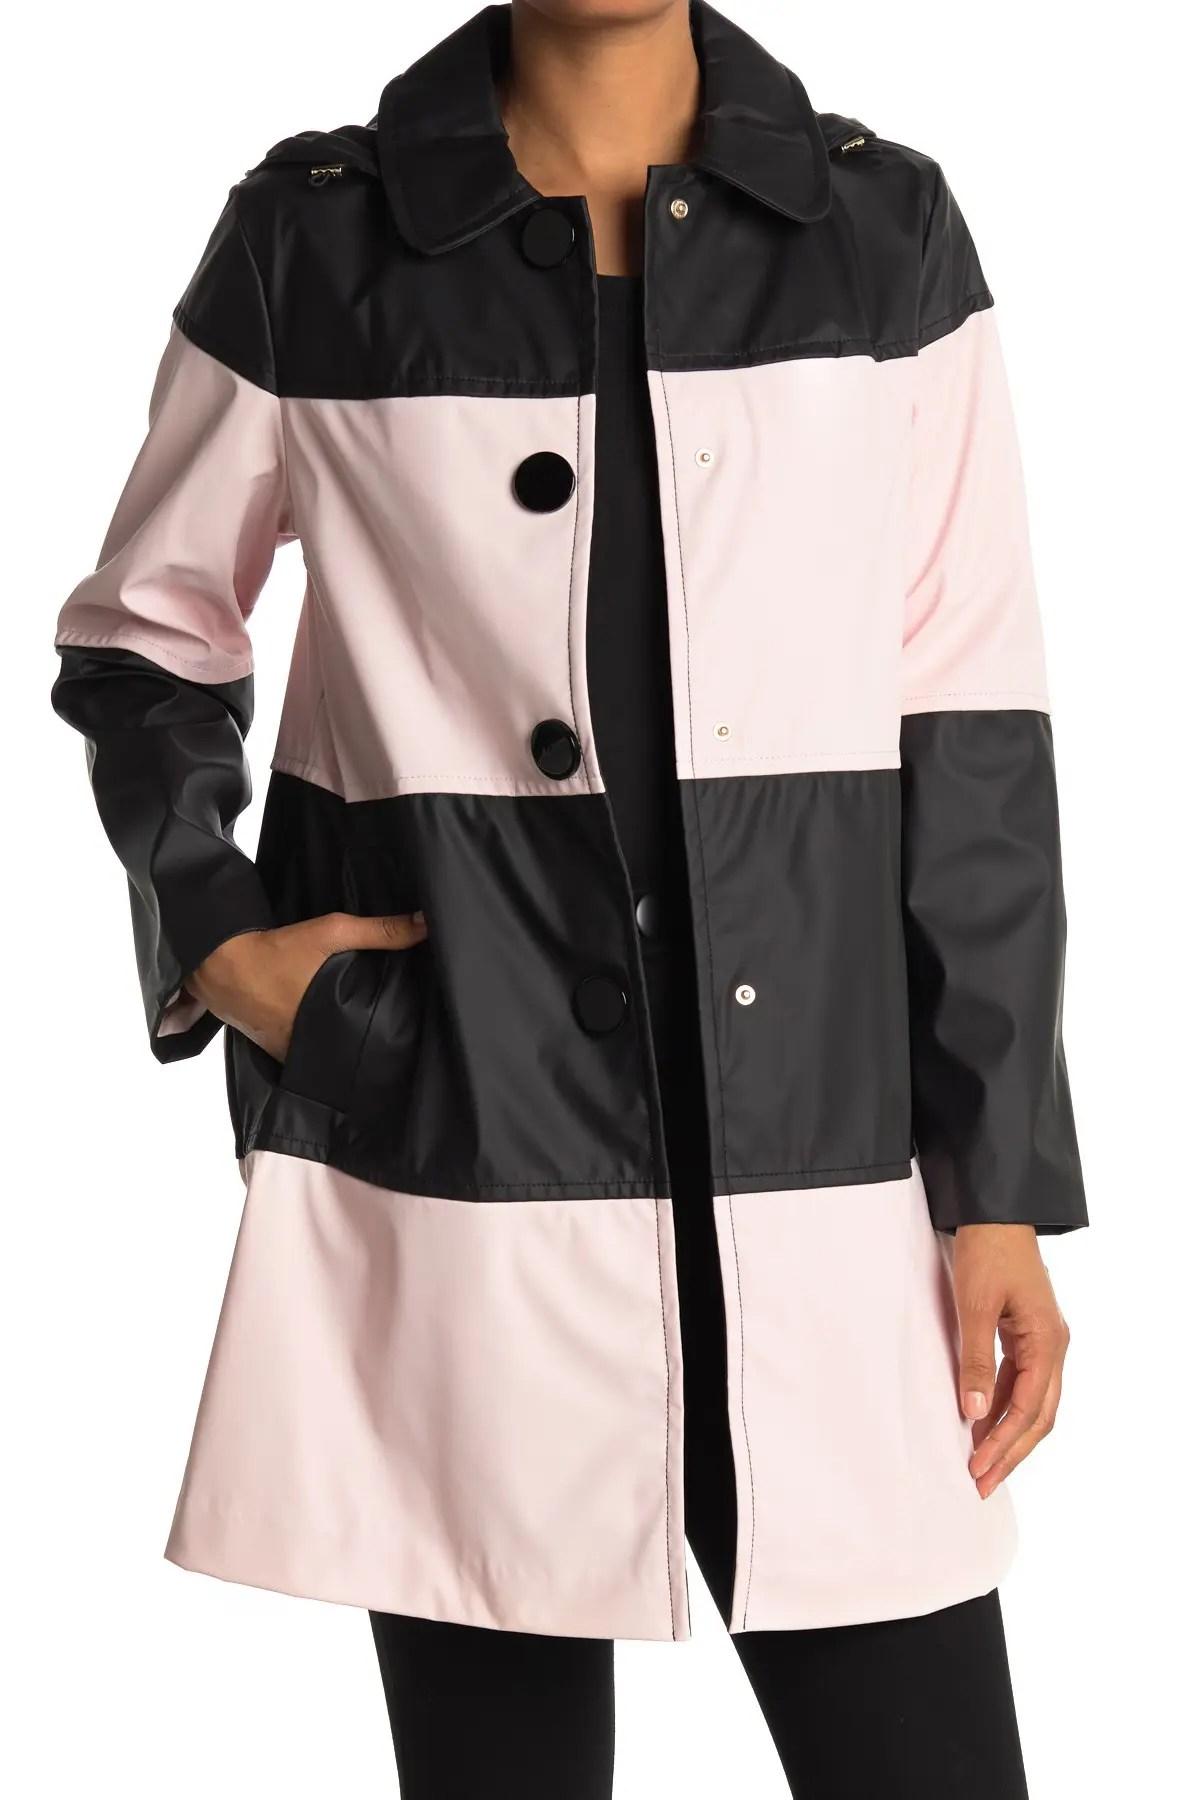 kate spade new york women s coats